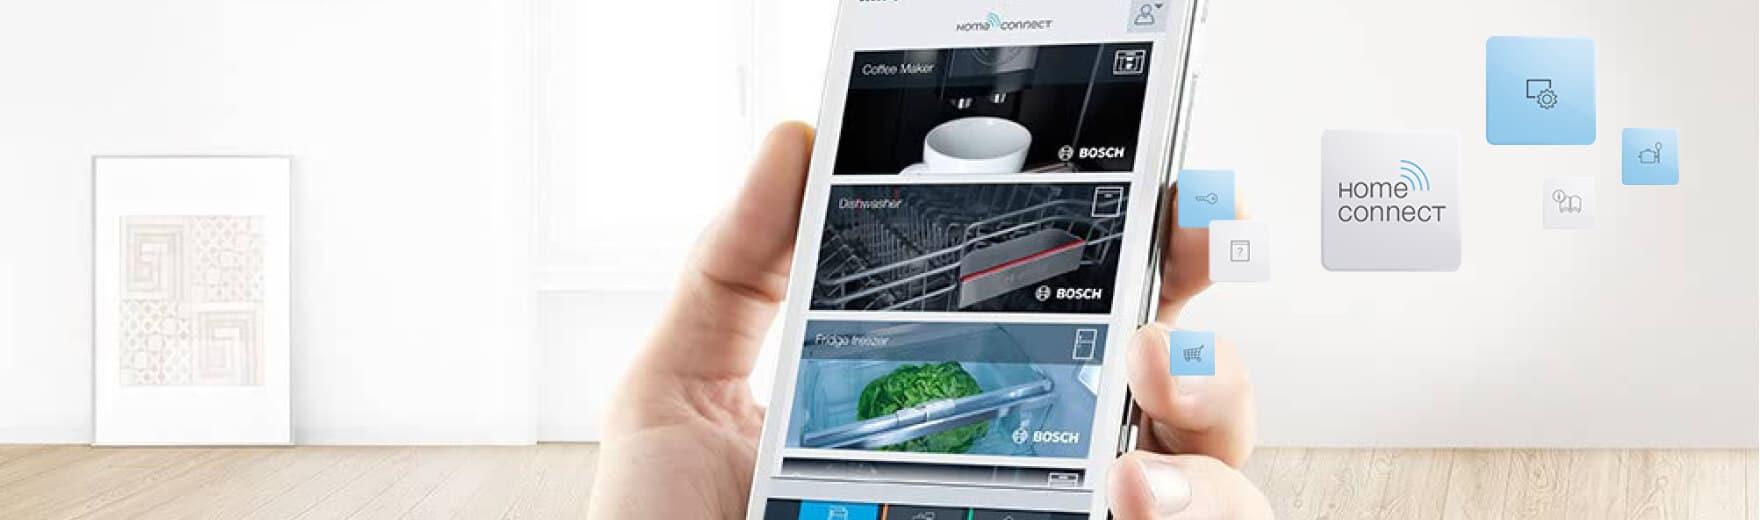 home connect, pilotez sa maison avec bosch | innovations concept yrys